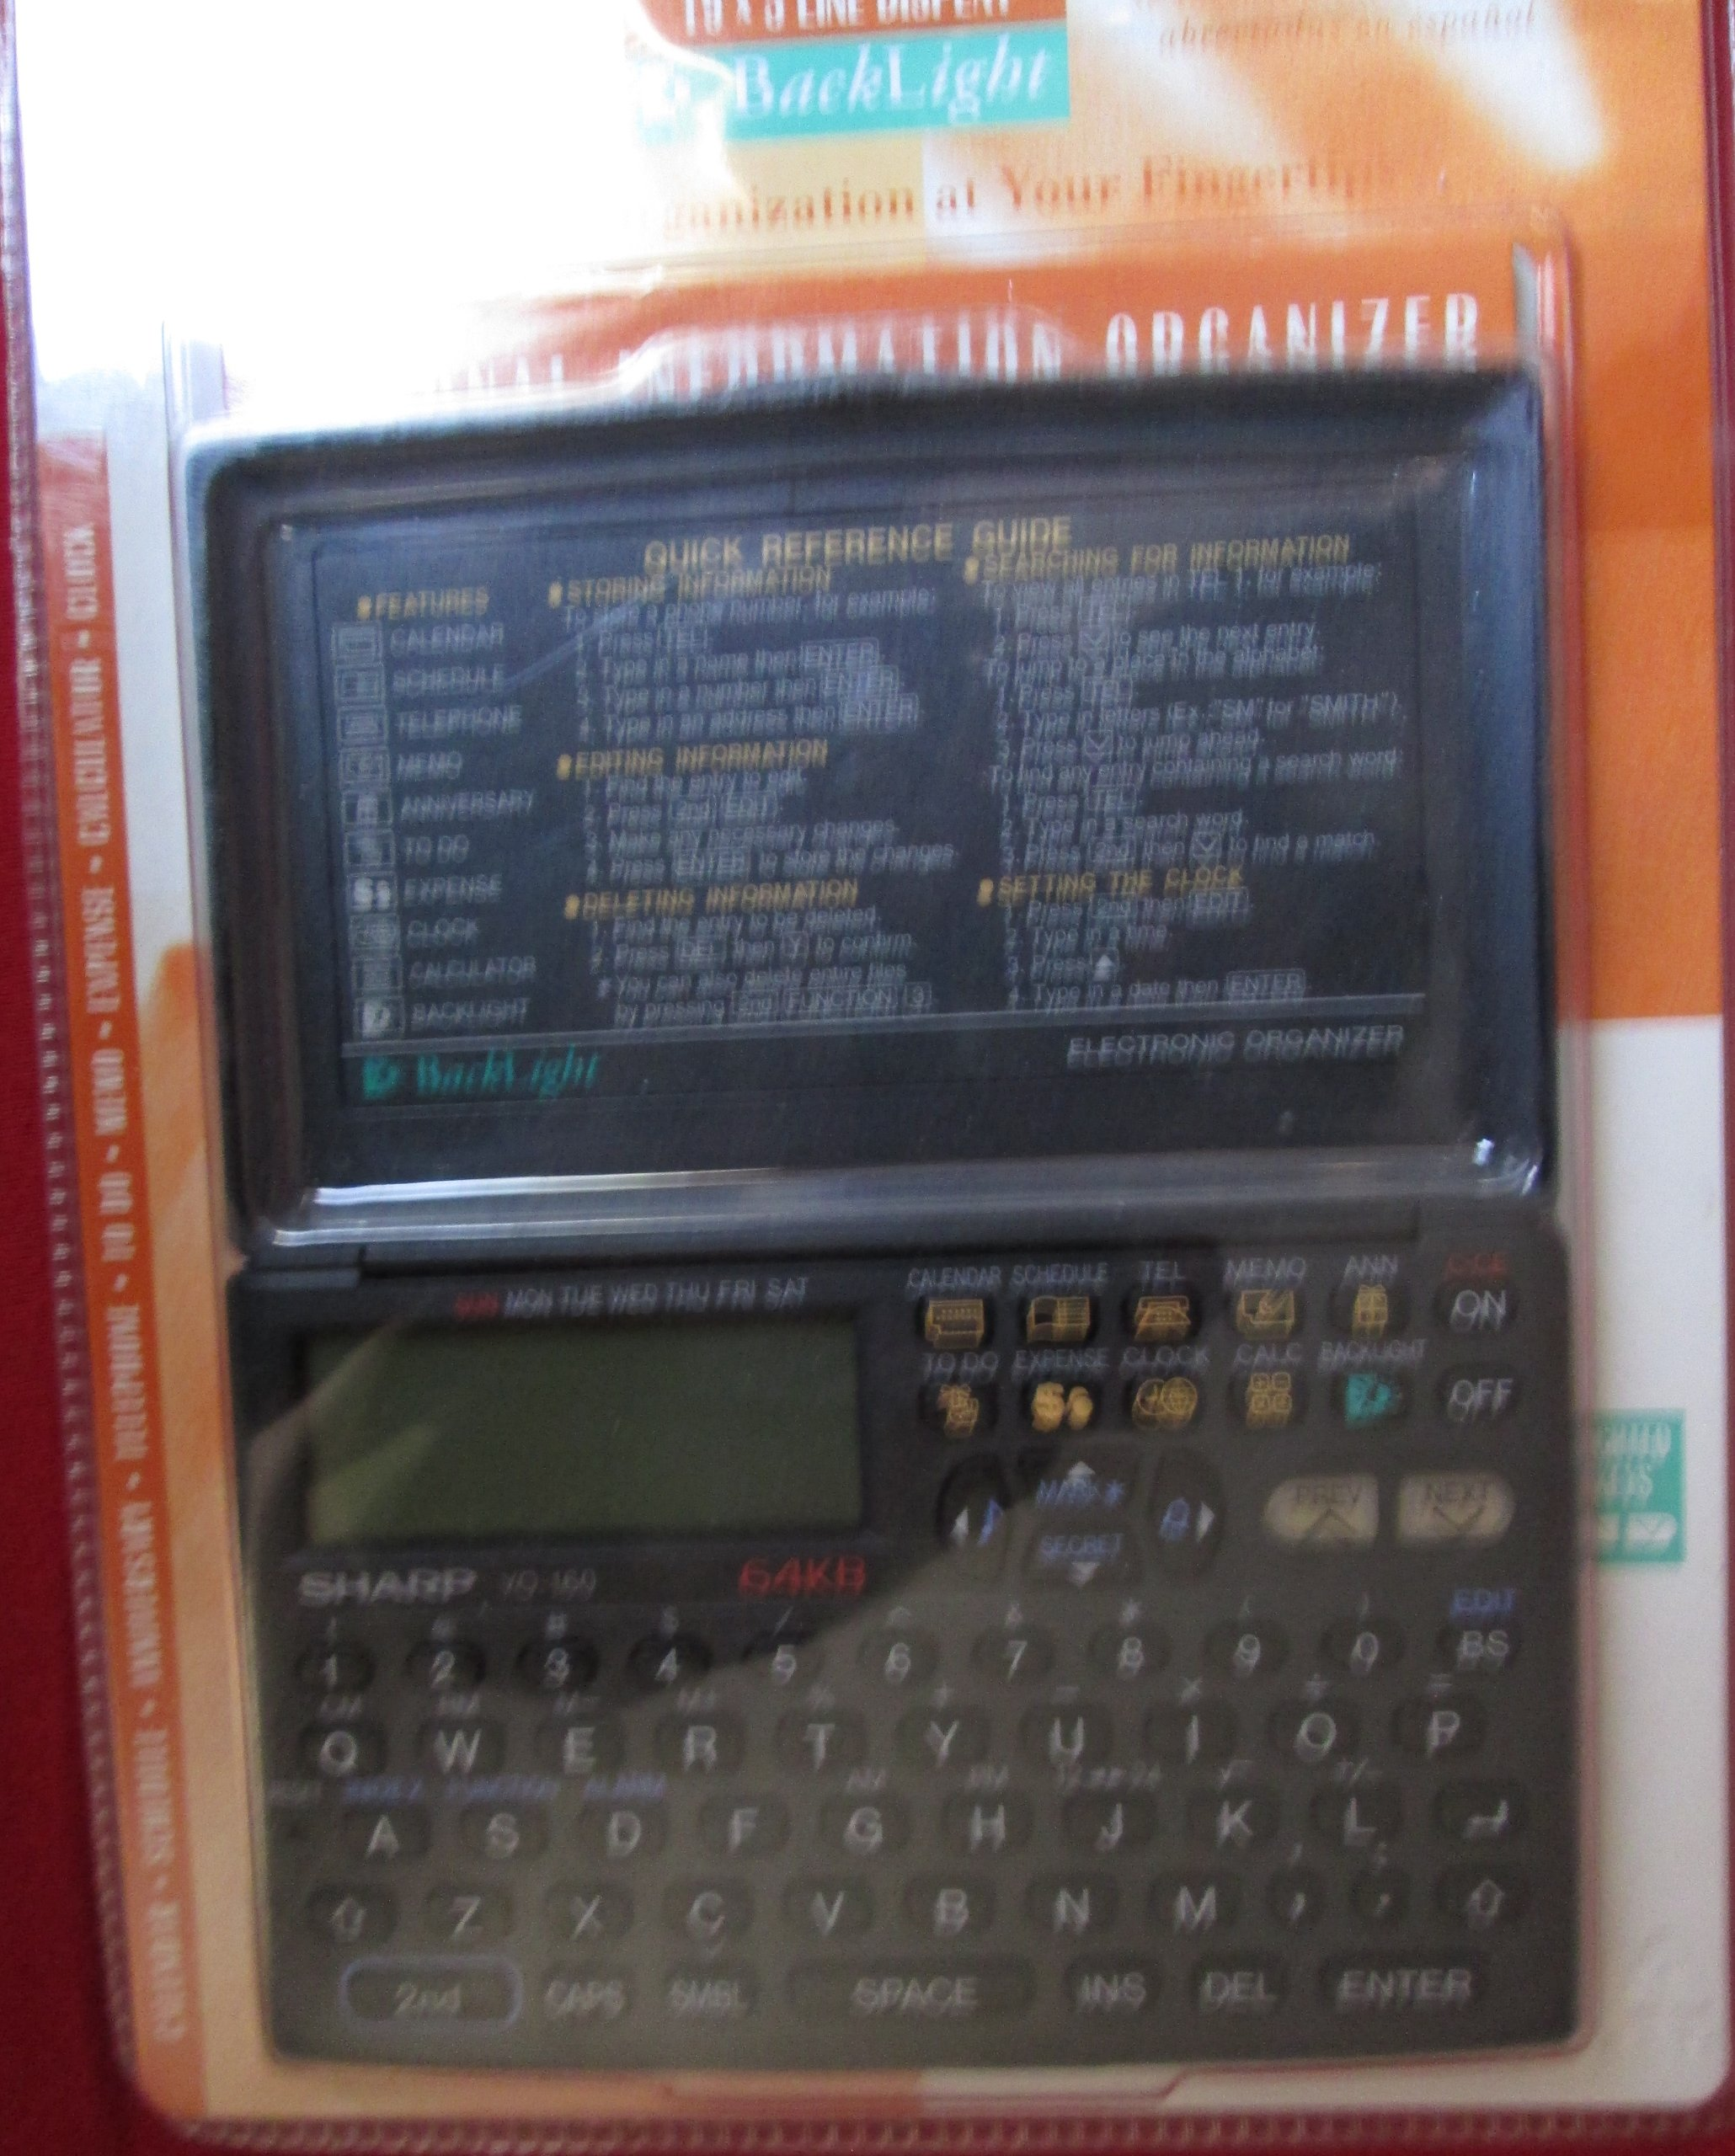 Sharp 64kb Personal Information Organizer Yo-160